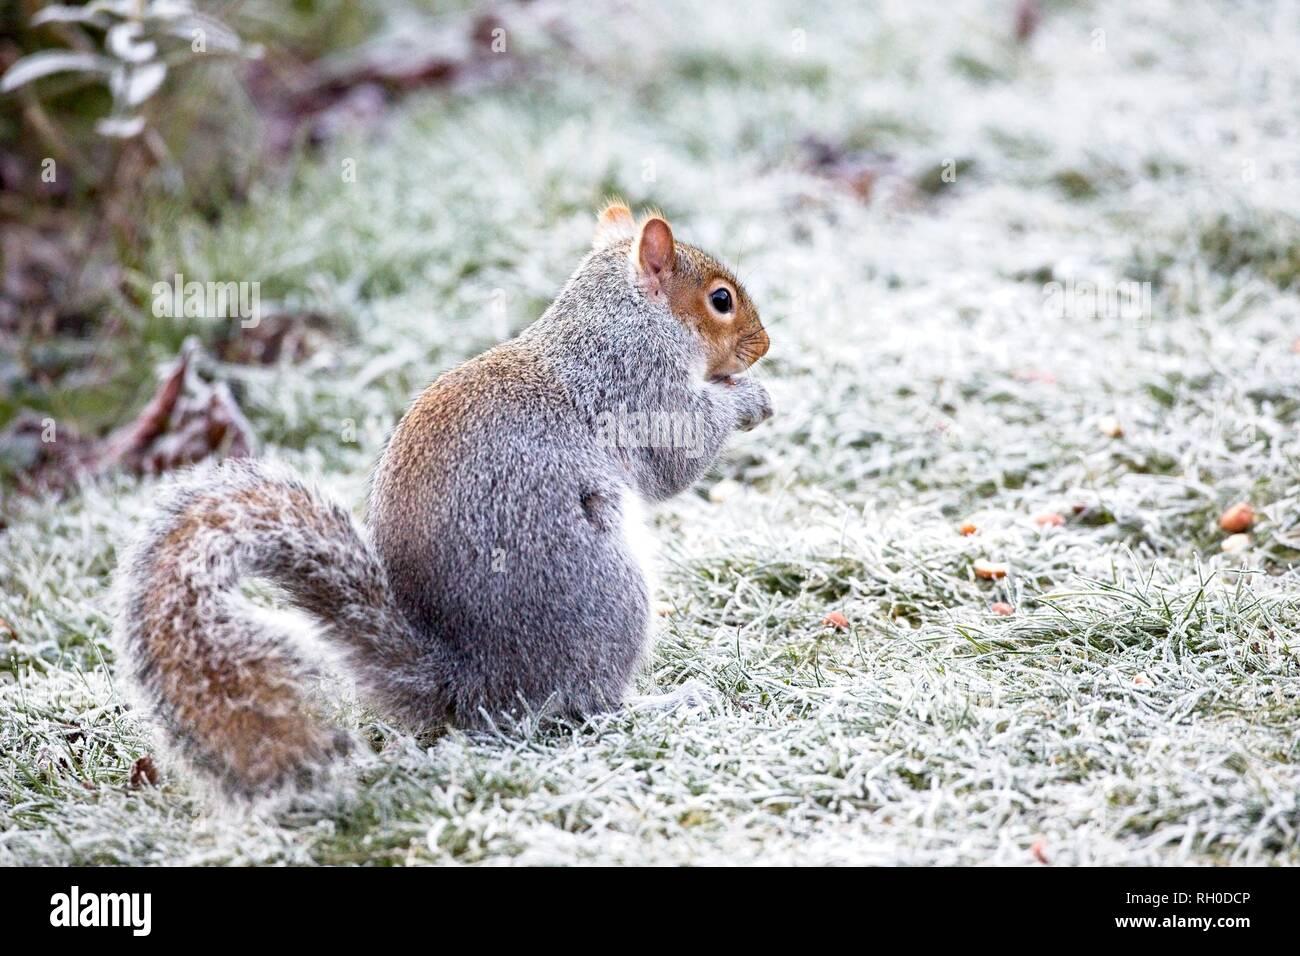 Hailsham, UK. 31st Jan, 2019. UK weather.A Grey squirrel (Sciurus carolinensis) struggles to find food this morning after a hard overnight frost in Hailsham, East Sussex, UK. Credit: Ed Brown/Alamy Live News - Stock Image